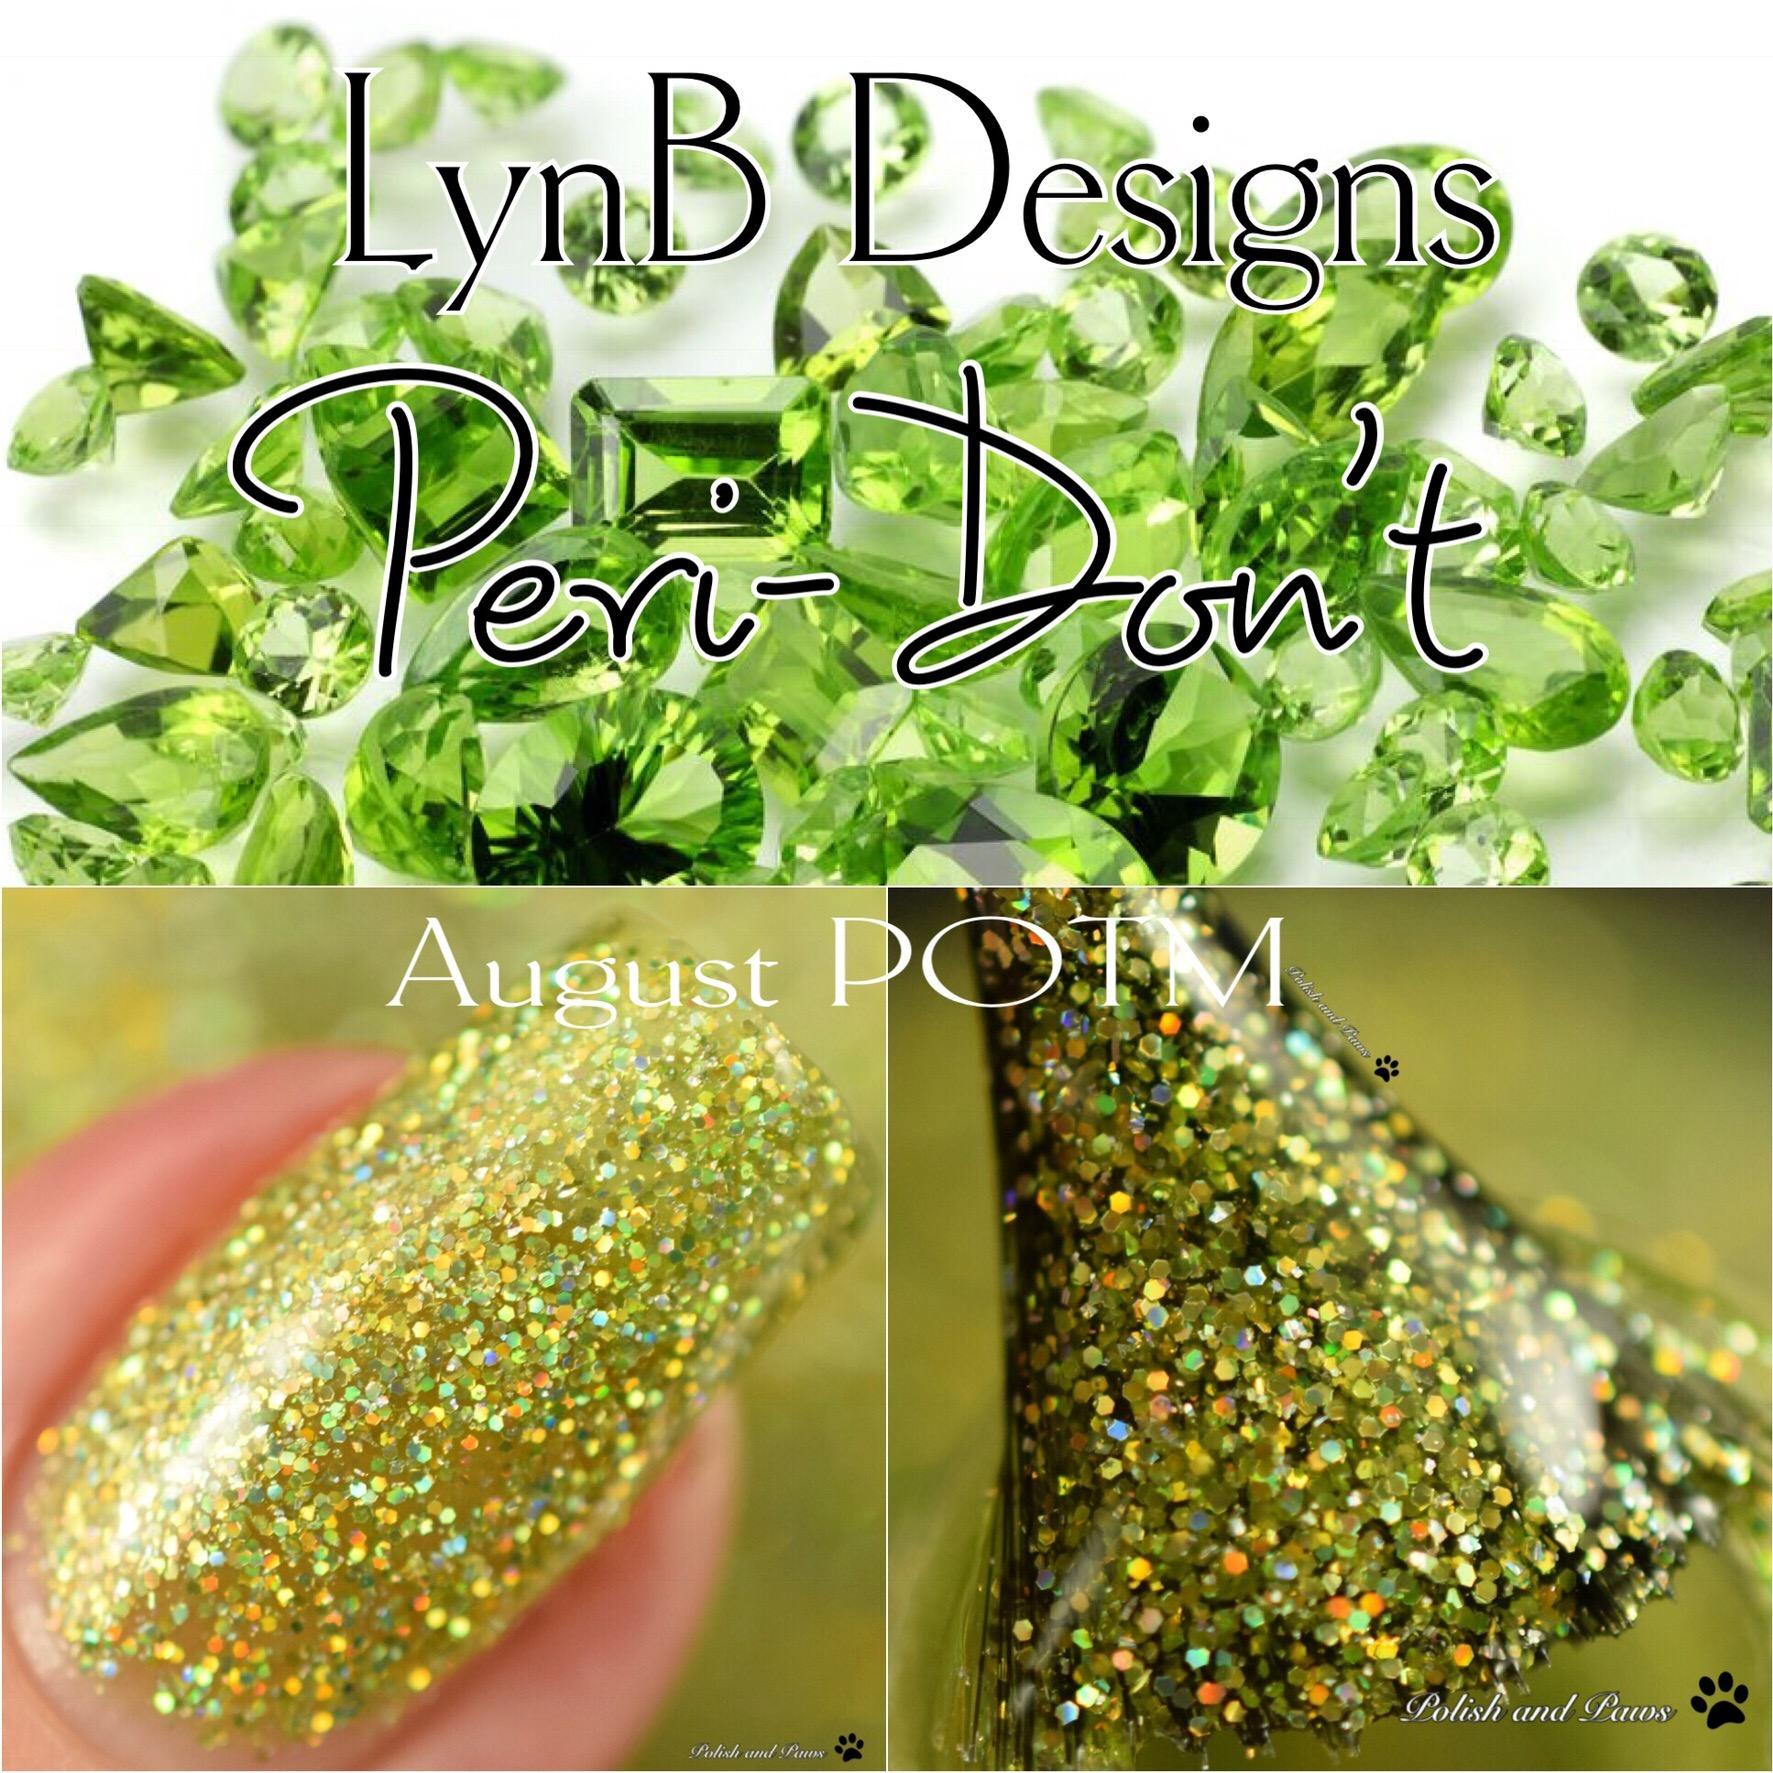 LynB Designs Peri-Don't